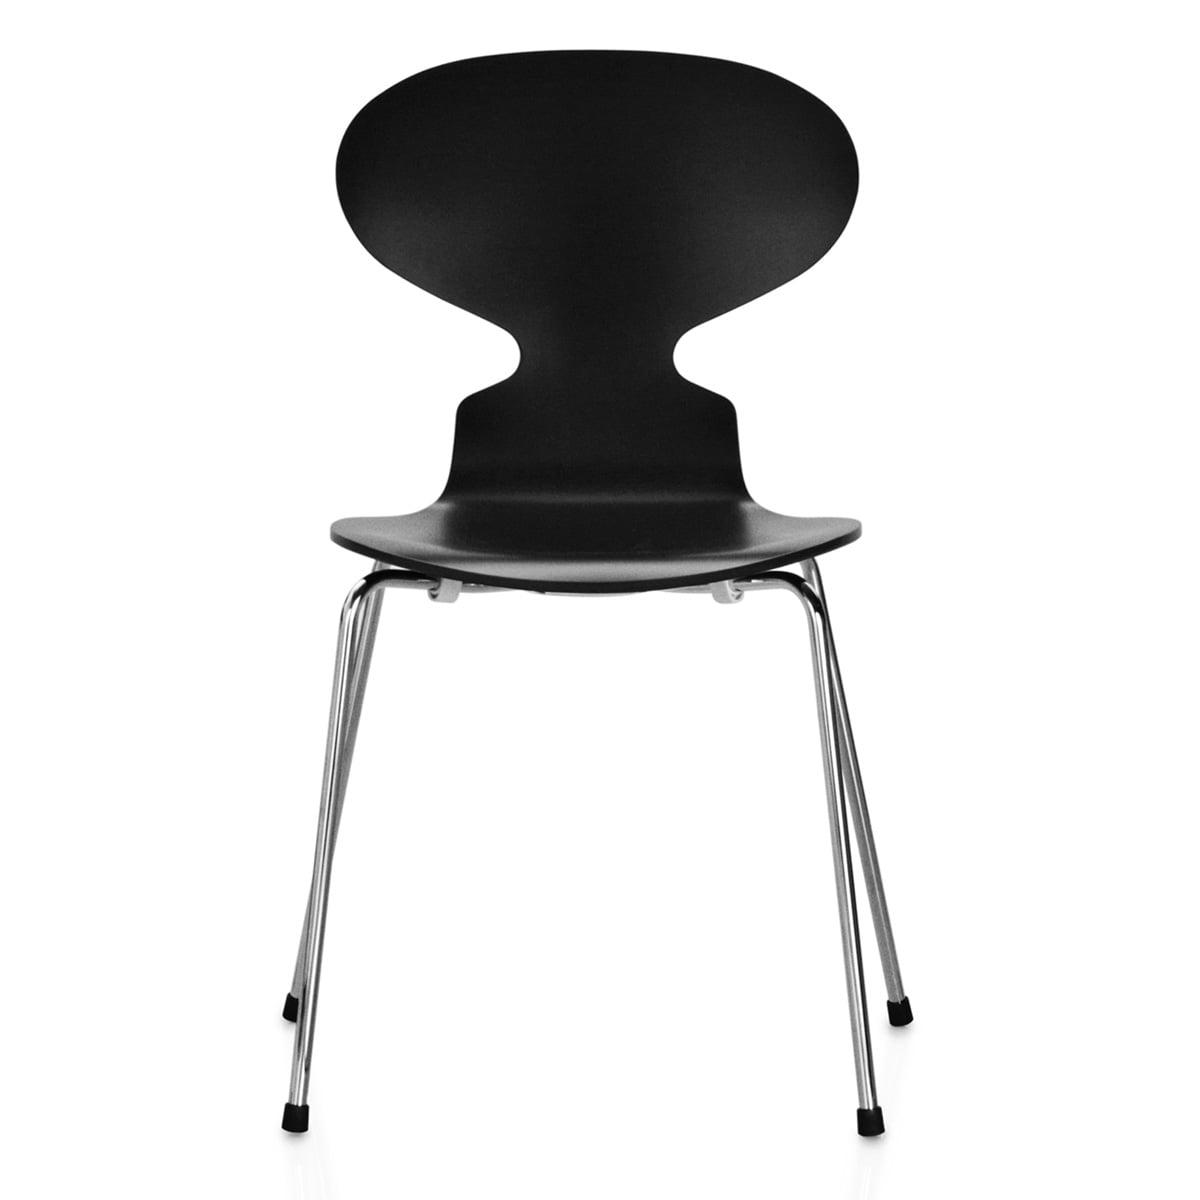 The Ant Chair Fritz Hansen